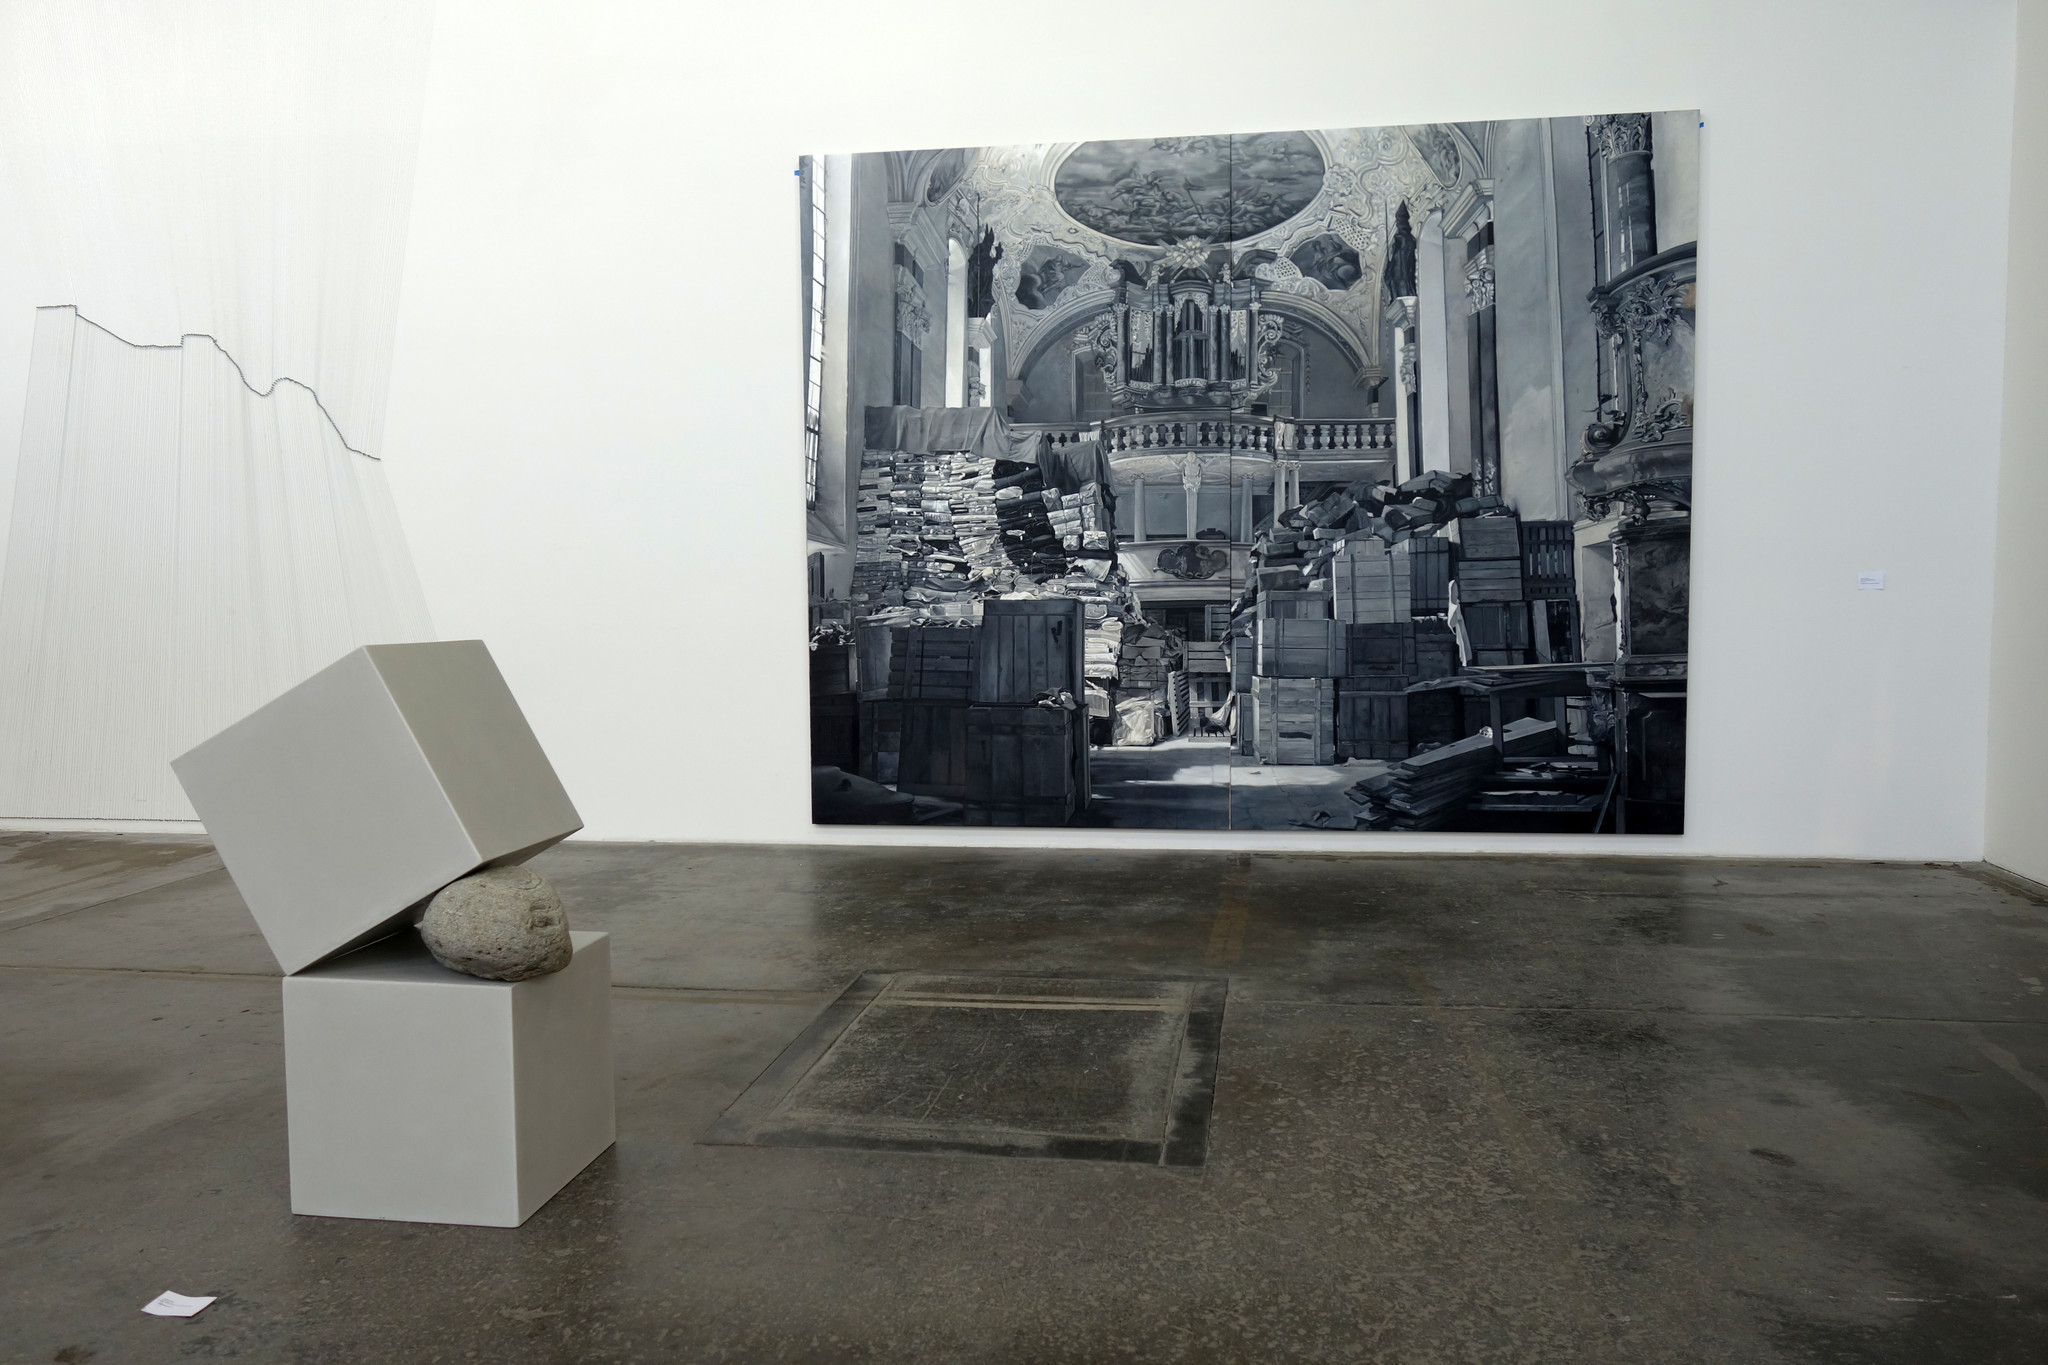 A 2017 sculpture by Mexican artist José Davila sits before a 2015 canvas by Chilean artist Josefina Guilisasti.